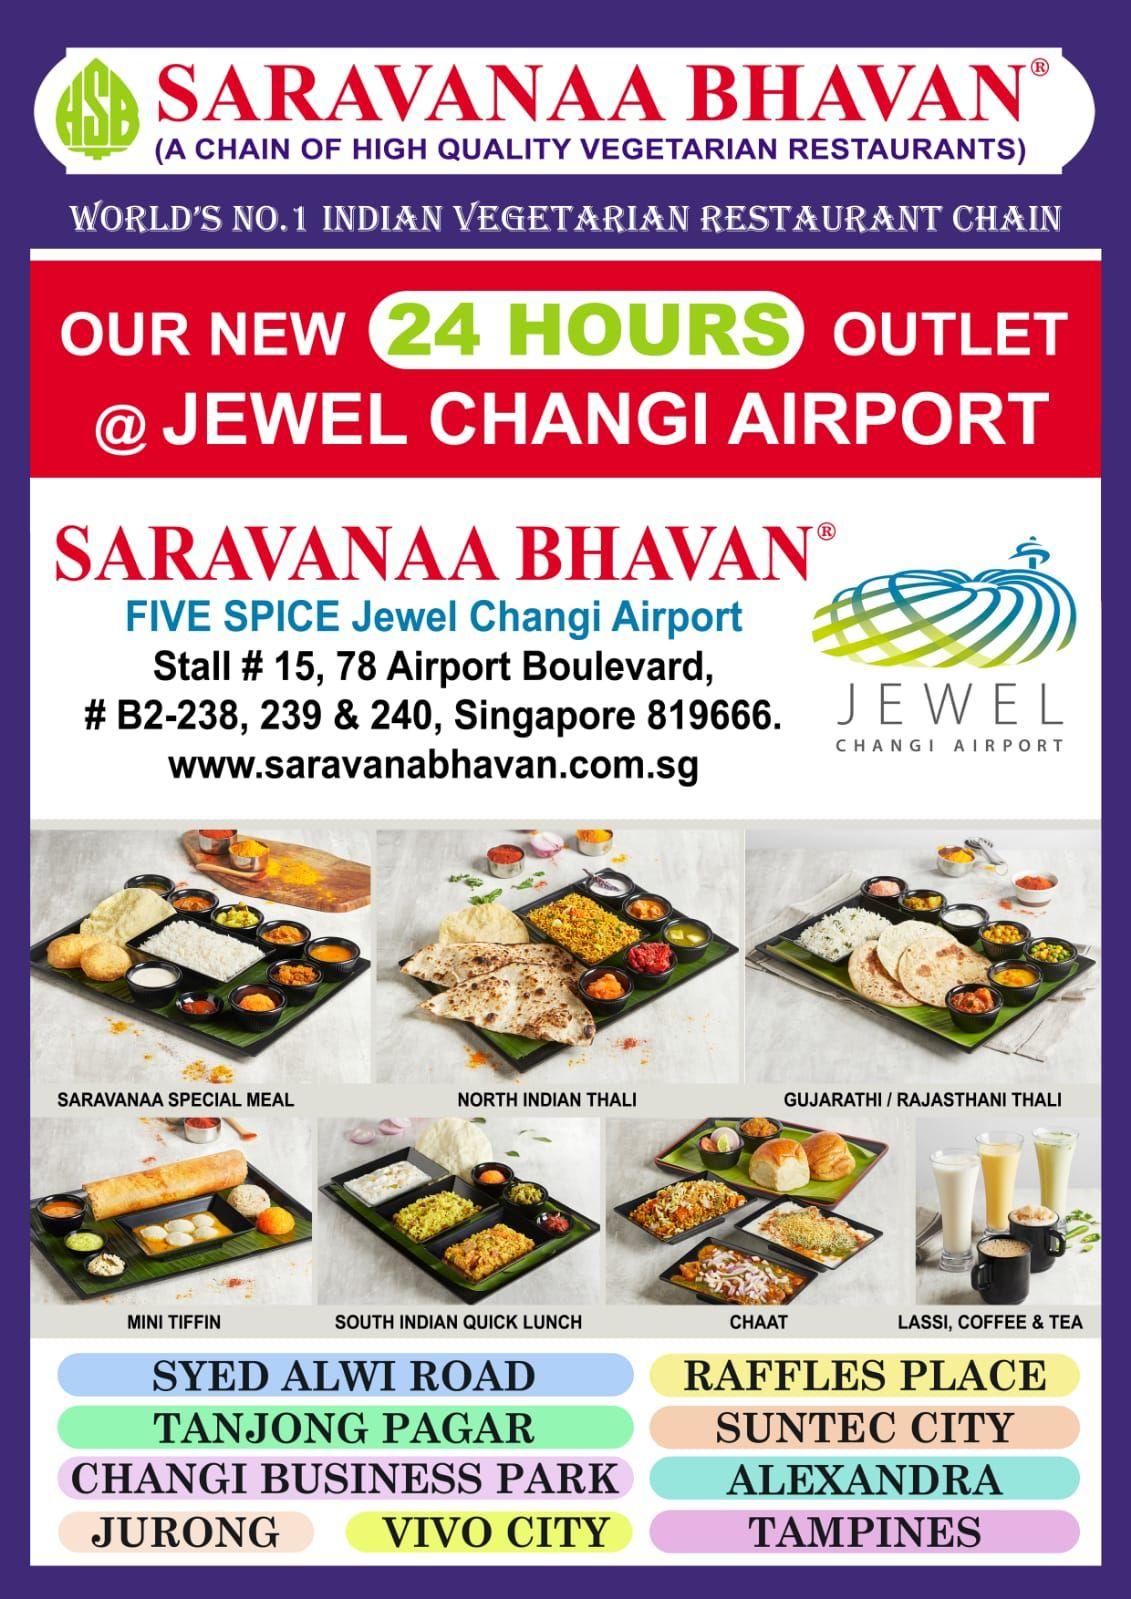 Saravana Bhavan Singapore Foods Are Available Jewel Changi Airport Saravanaabhavansg Newoutlet Branch Service Jewelchangiairp Singapore Food Food Chaat